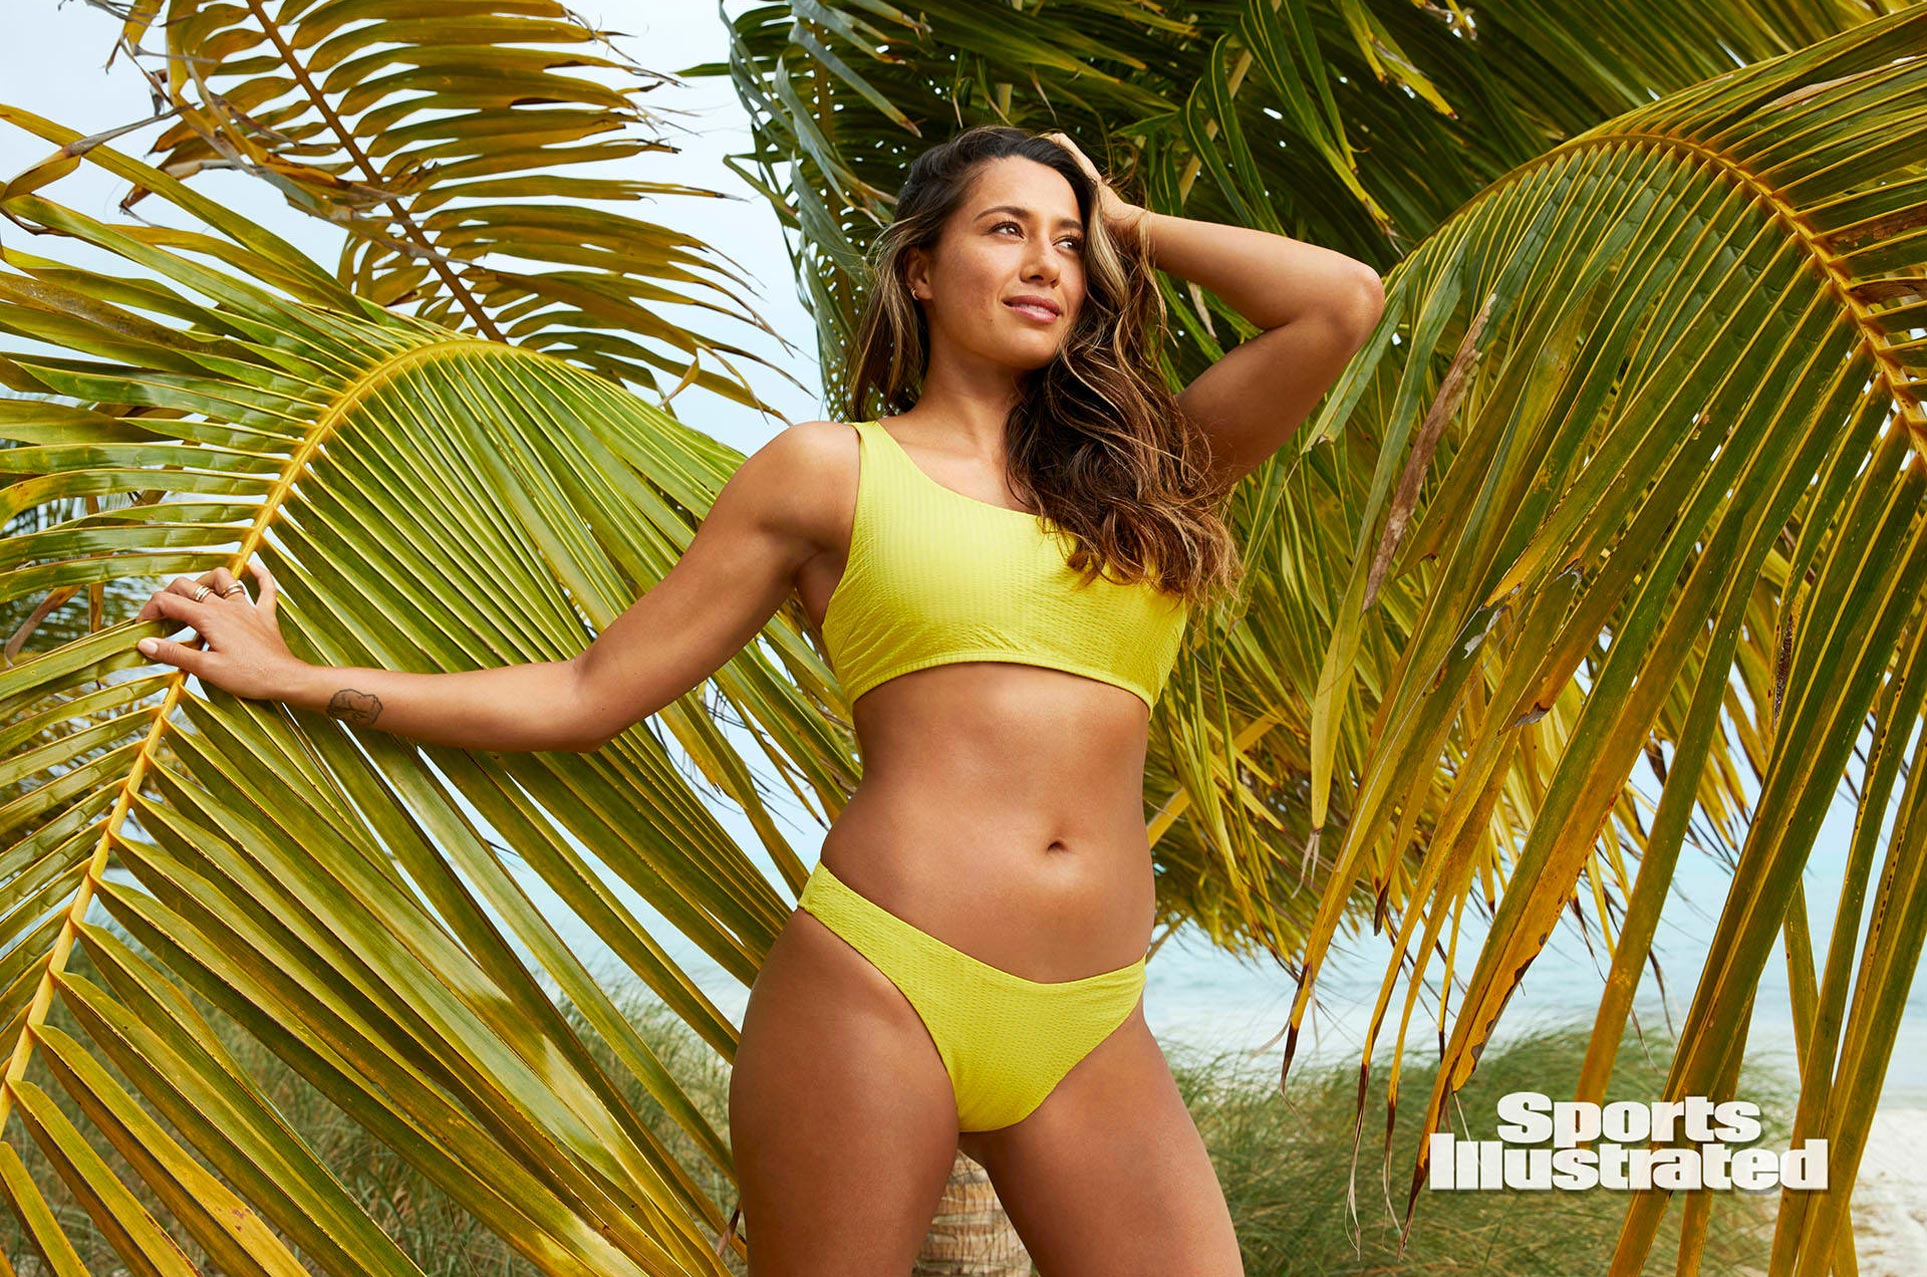 Малия Мануэль в каталоге купальников Sports Illustrated Swimsuit 2020 / фото 12